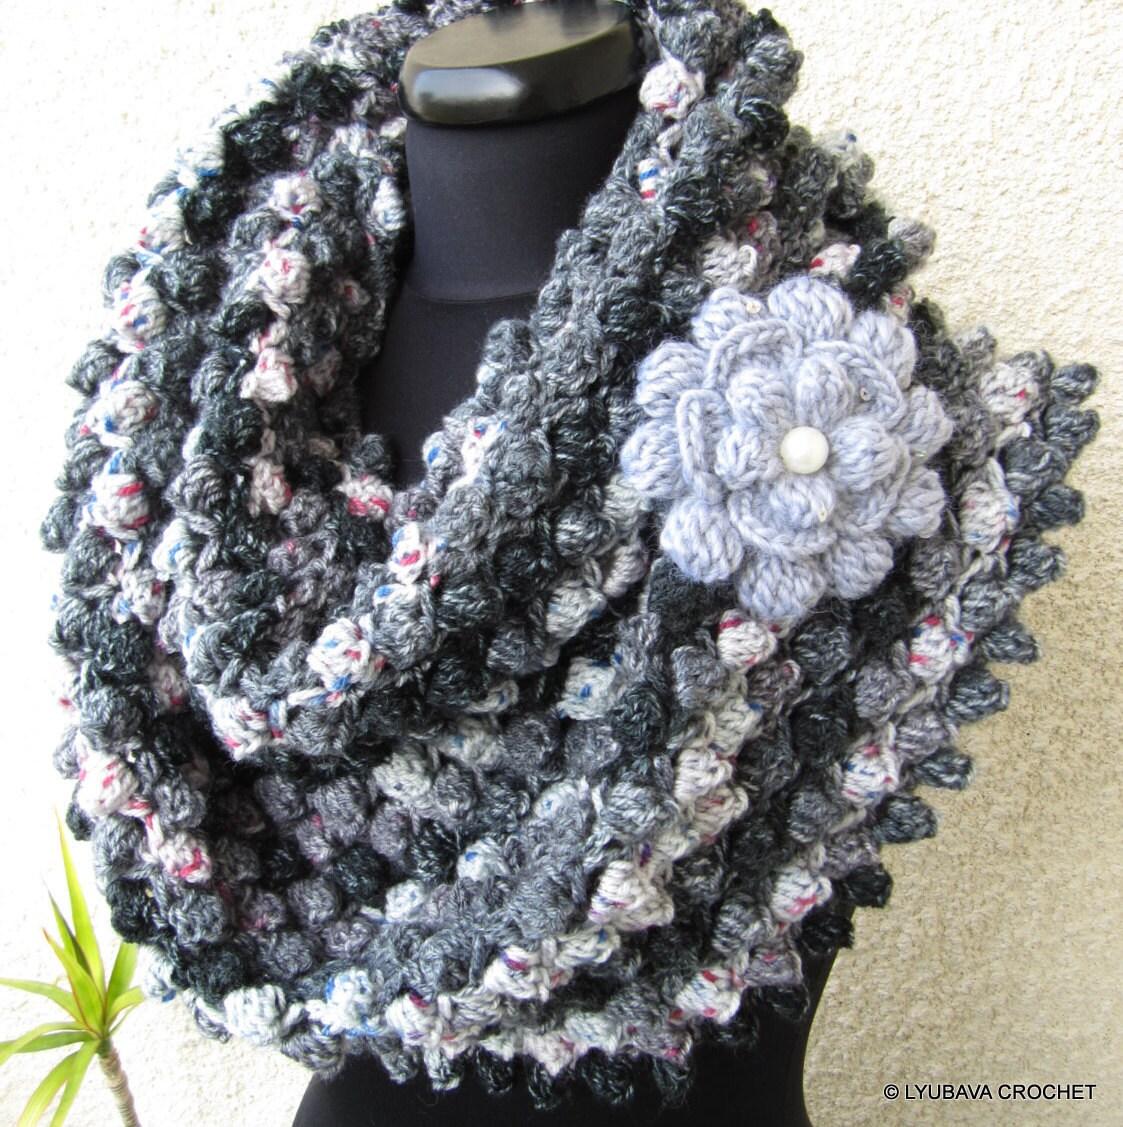 Crochet Scarf Patterns With Popcorn Stitch : Crochet Scarf PATTERN Infinity Scarf Flower Pattern DIY